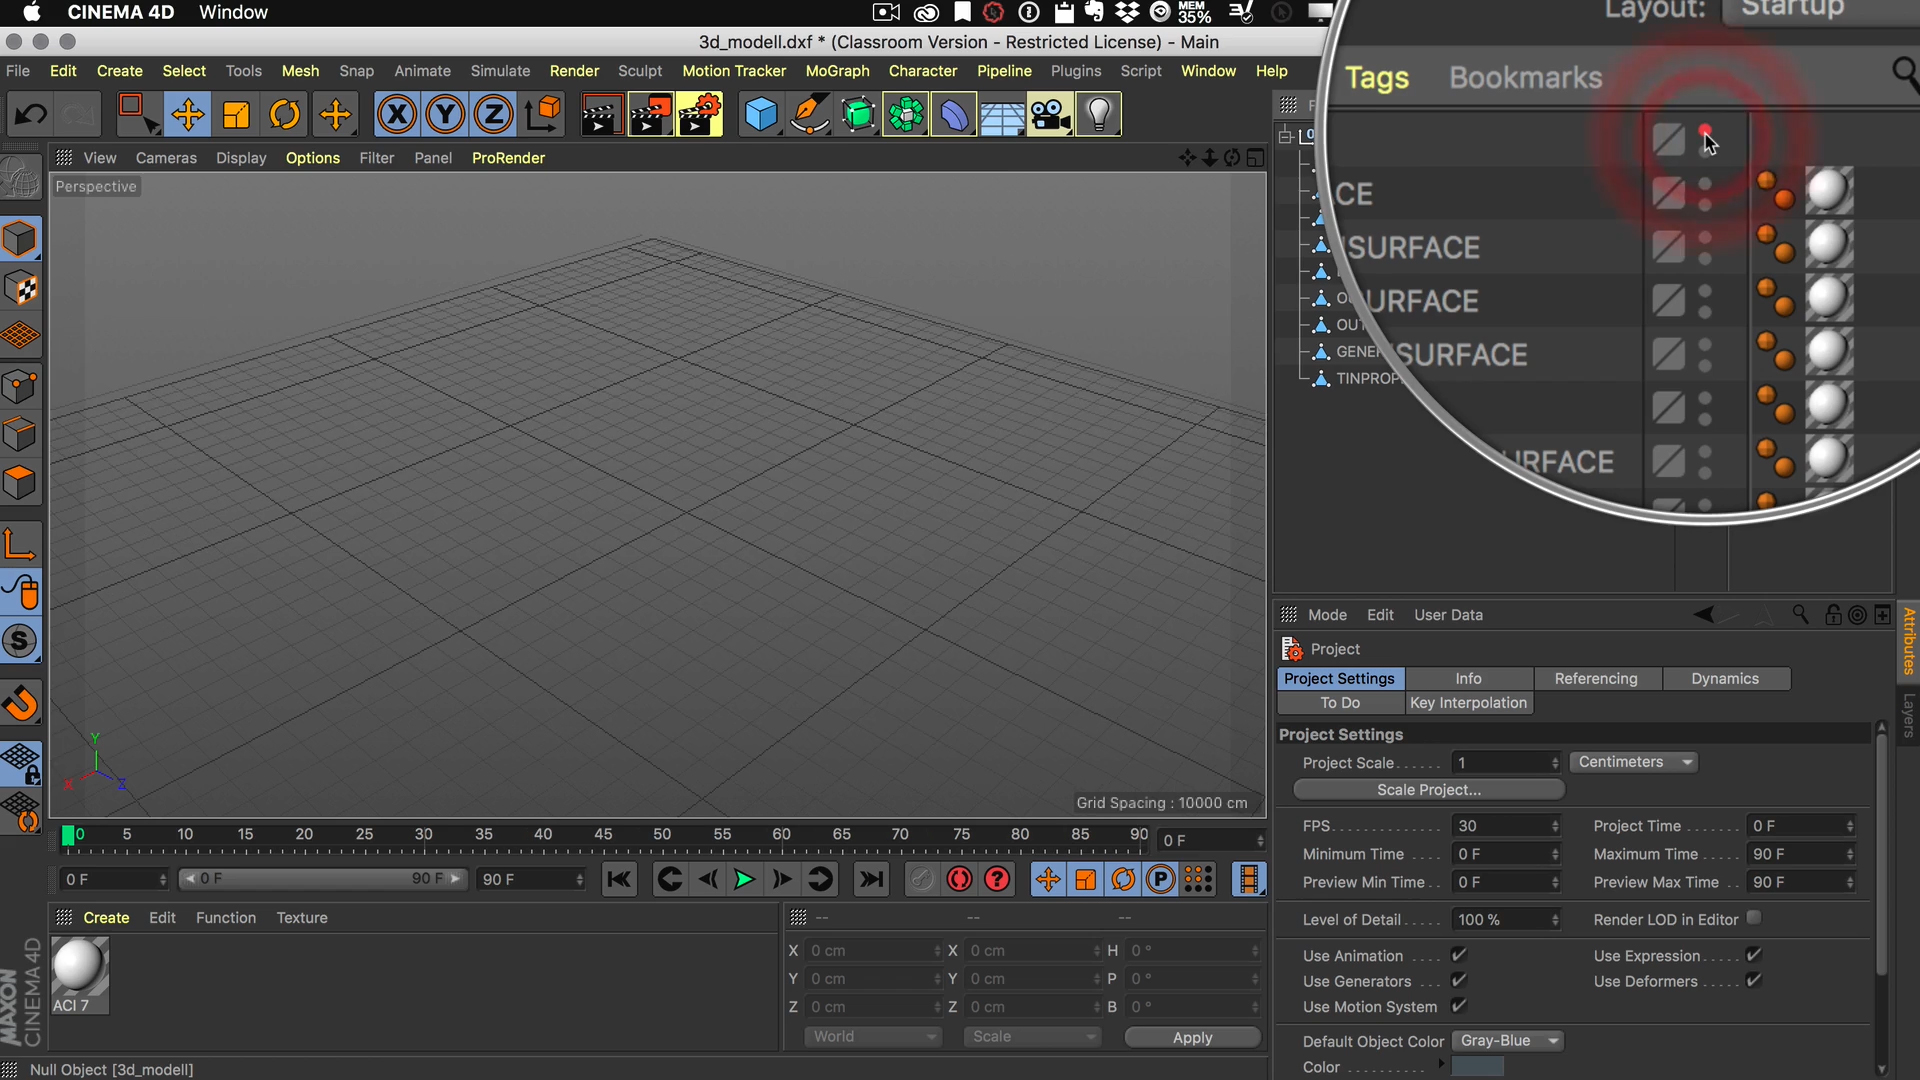 Cinema4D 3D-Stadtmodell Modell Editor Viewport ausgeblendet